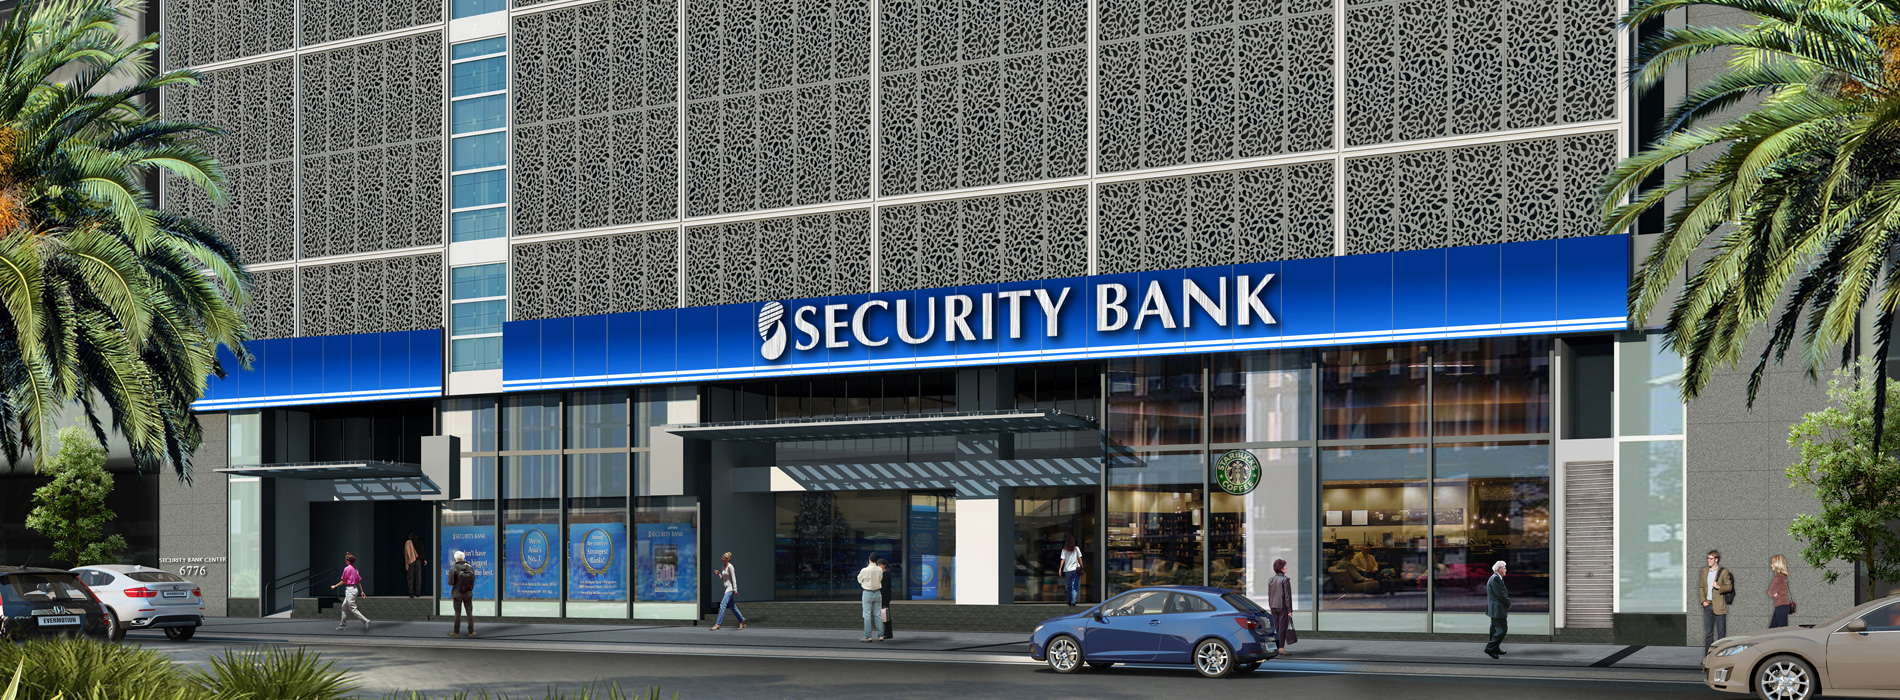 Security Bank 6797 Ayala Avenue